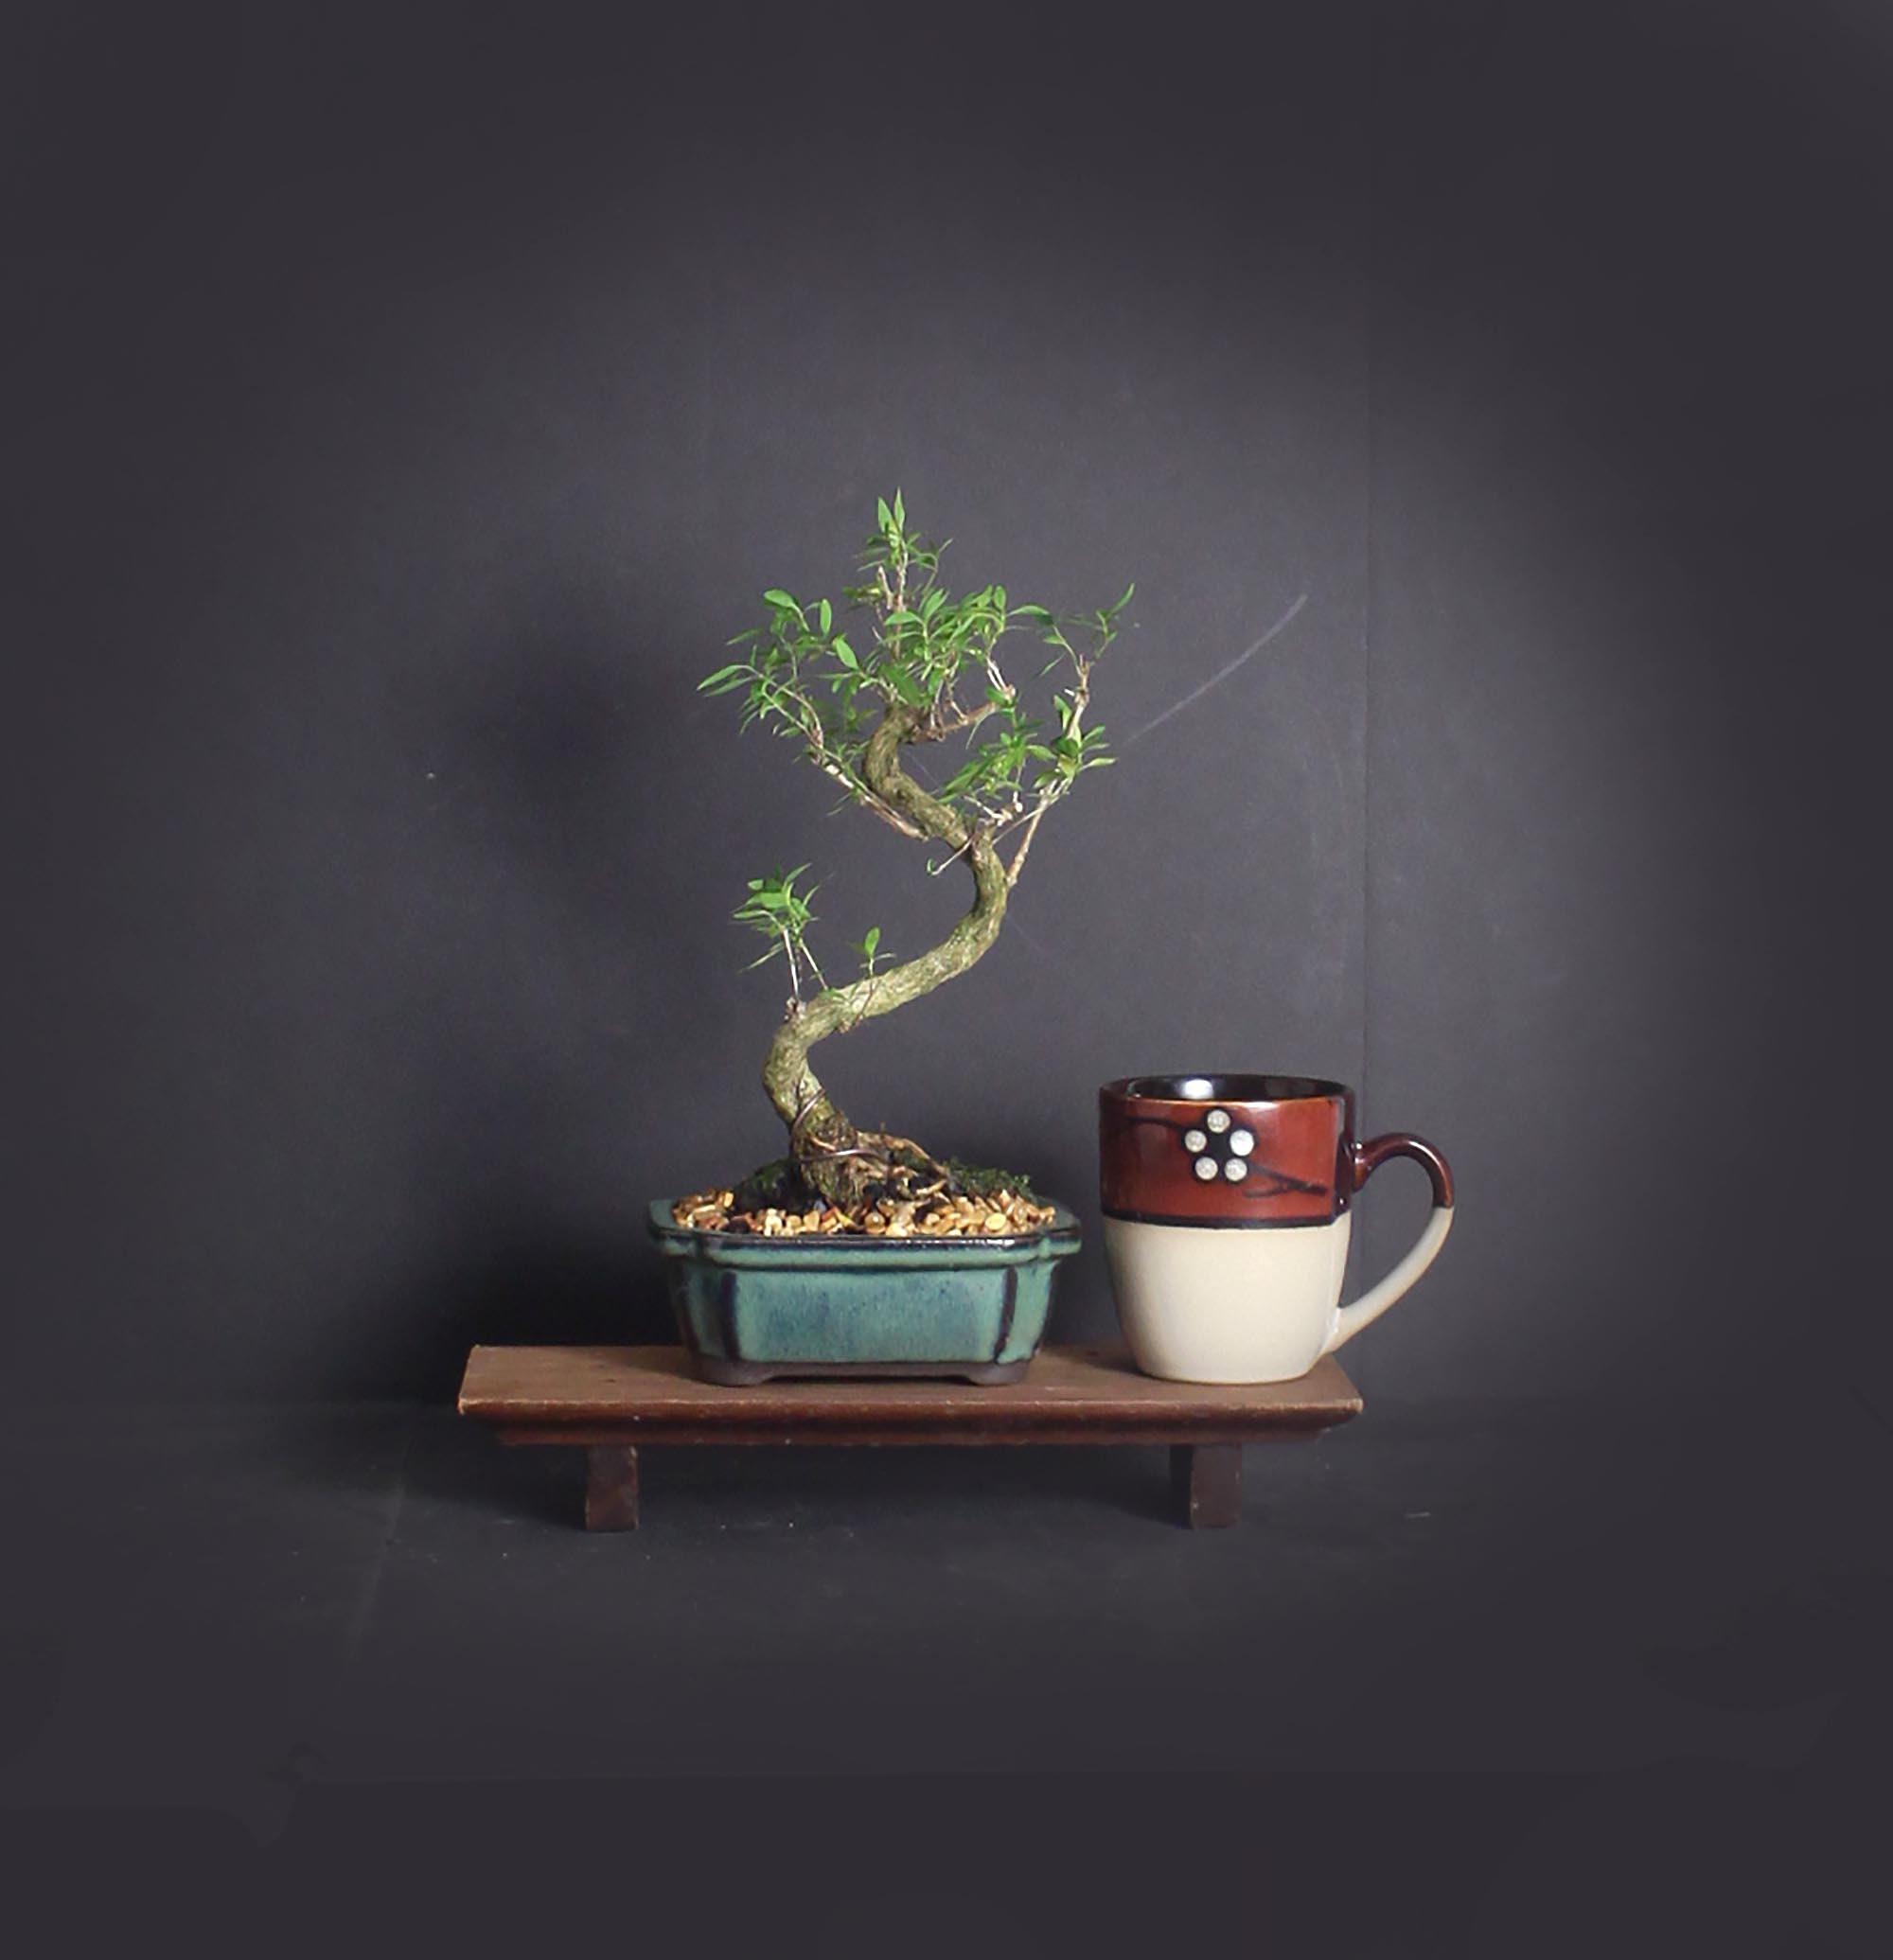 Serissa snow rose bonsai tree, Indoor bonsai tree collection